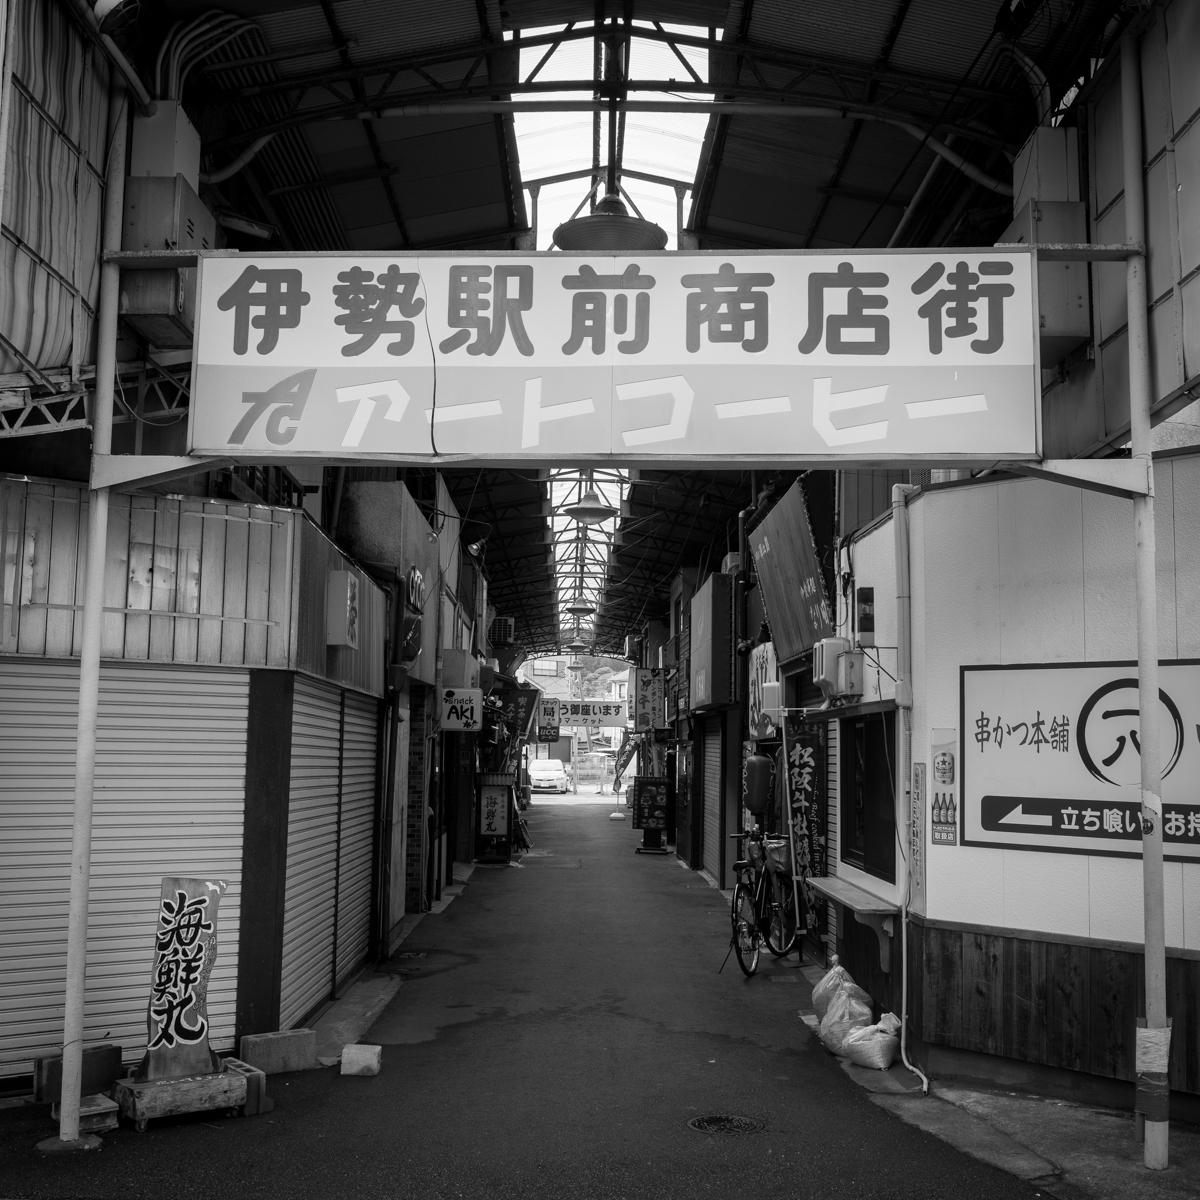 f:id:nagoya-meshi:20191023003022j:plain